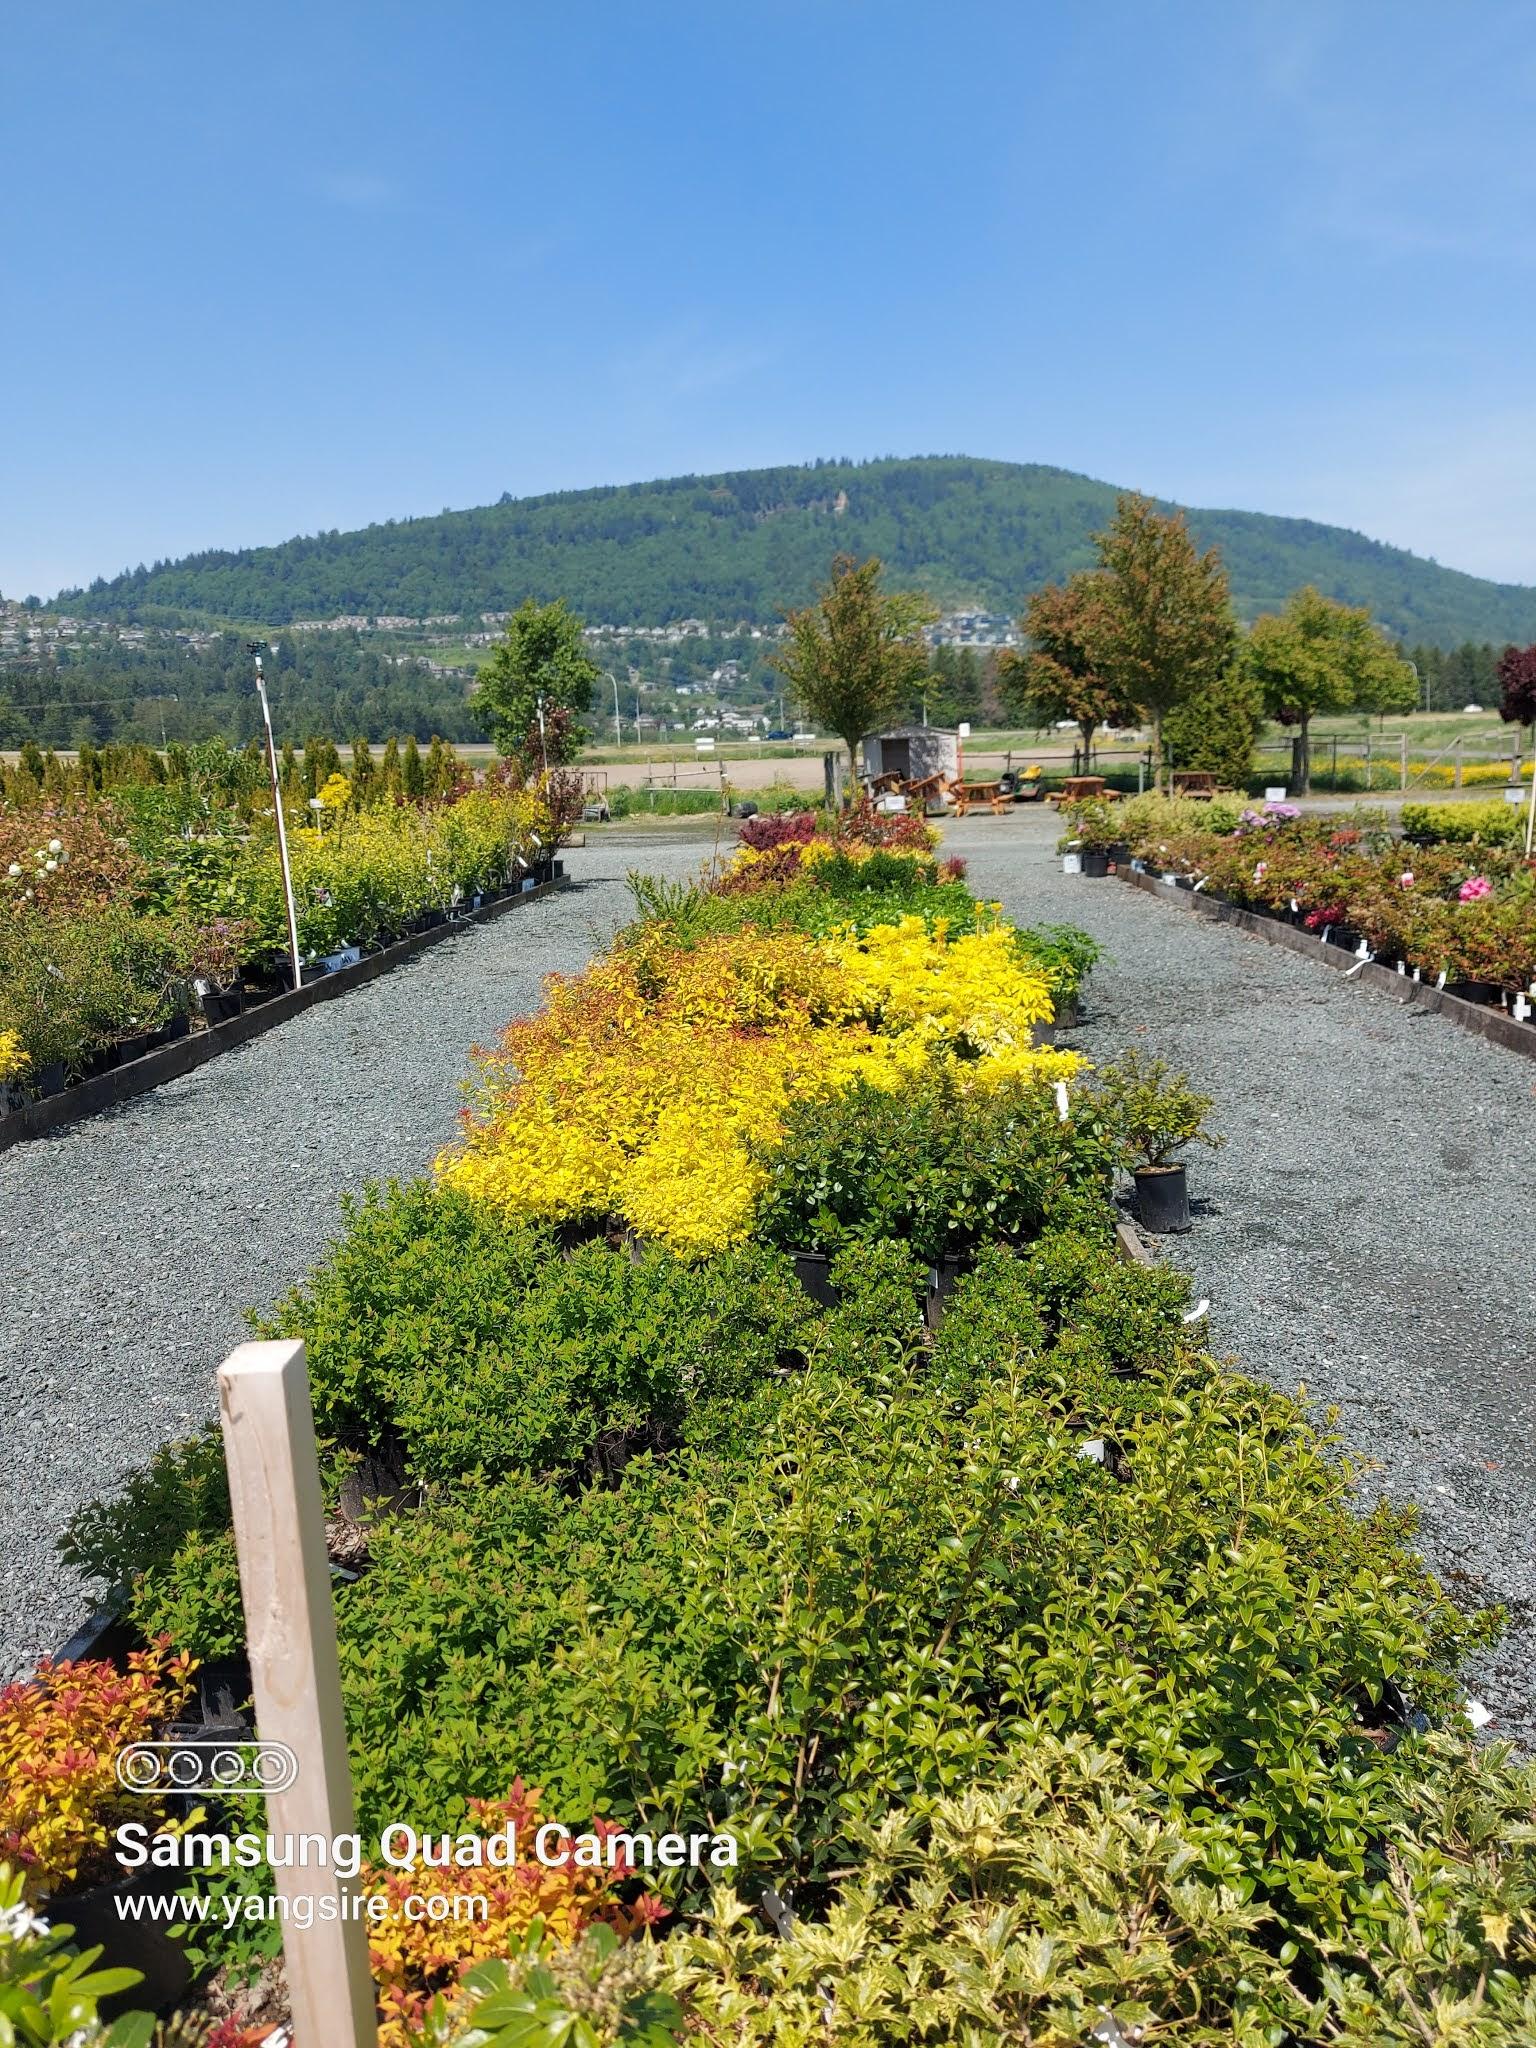 Five maples nursery and garden centre